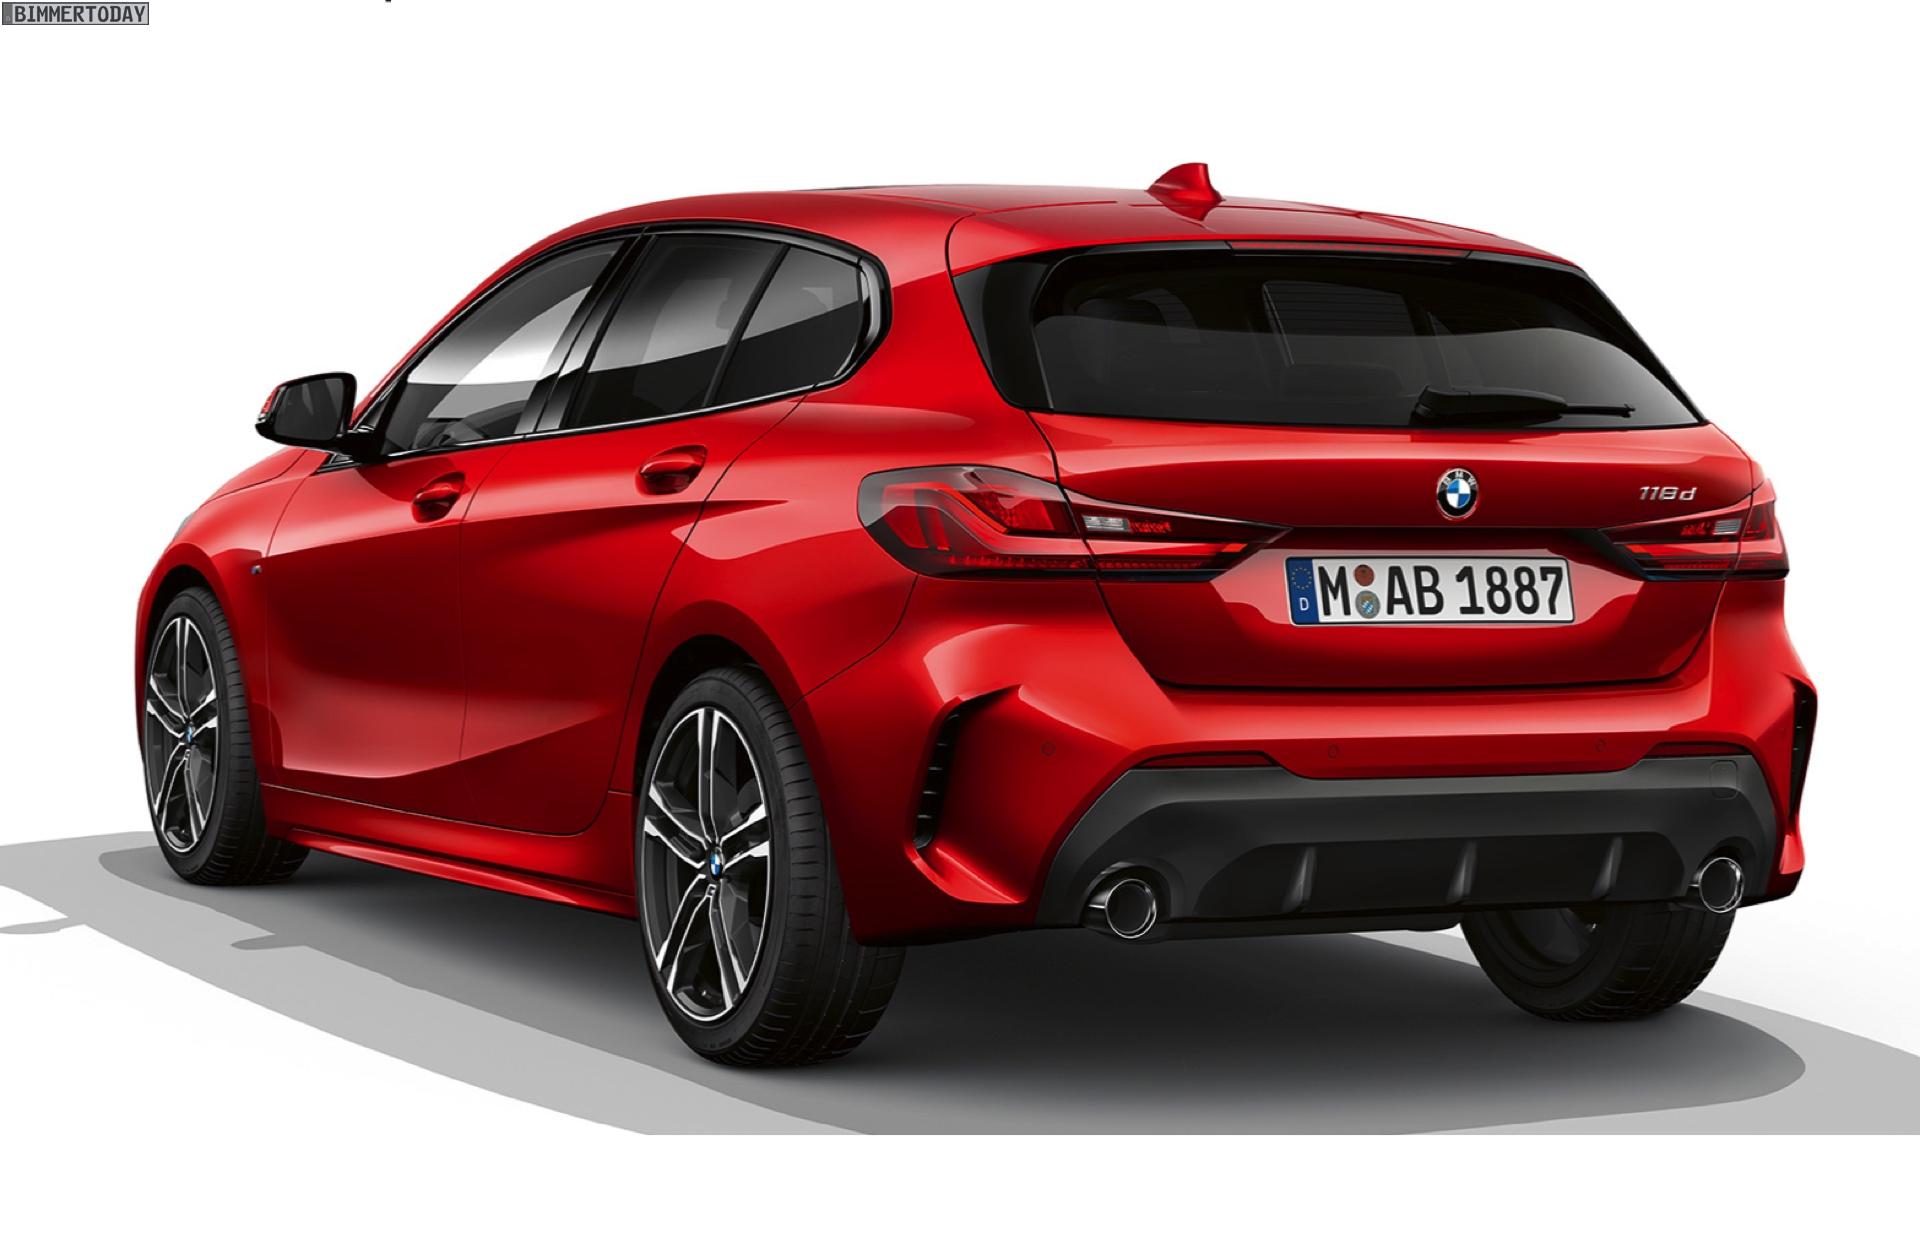 2019 Bmw 1 Series F40 M Sports Sport Line Luxury Line In Comparison